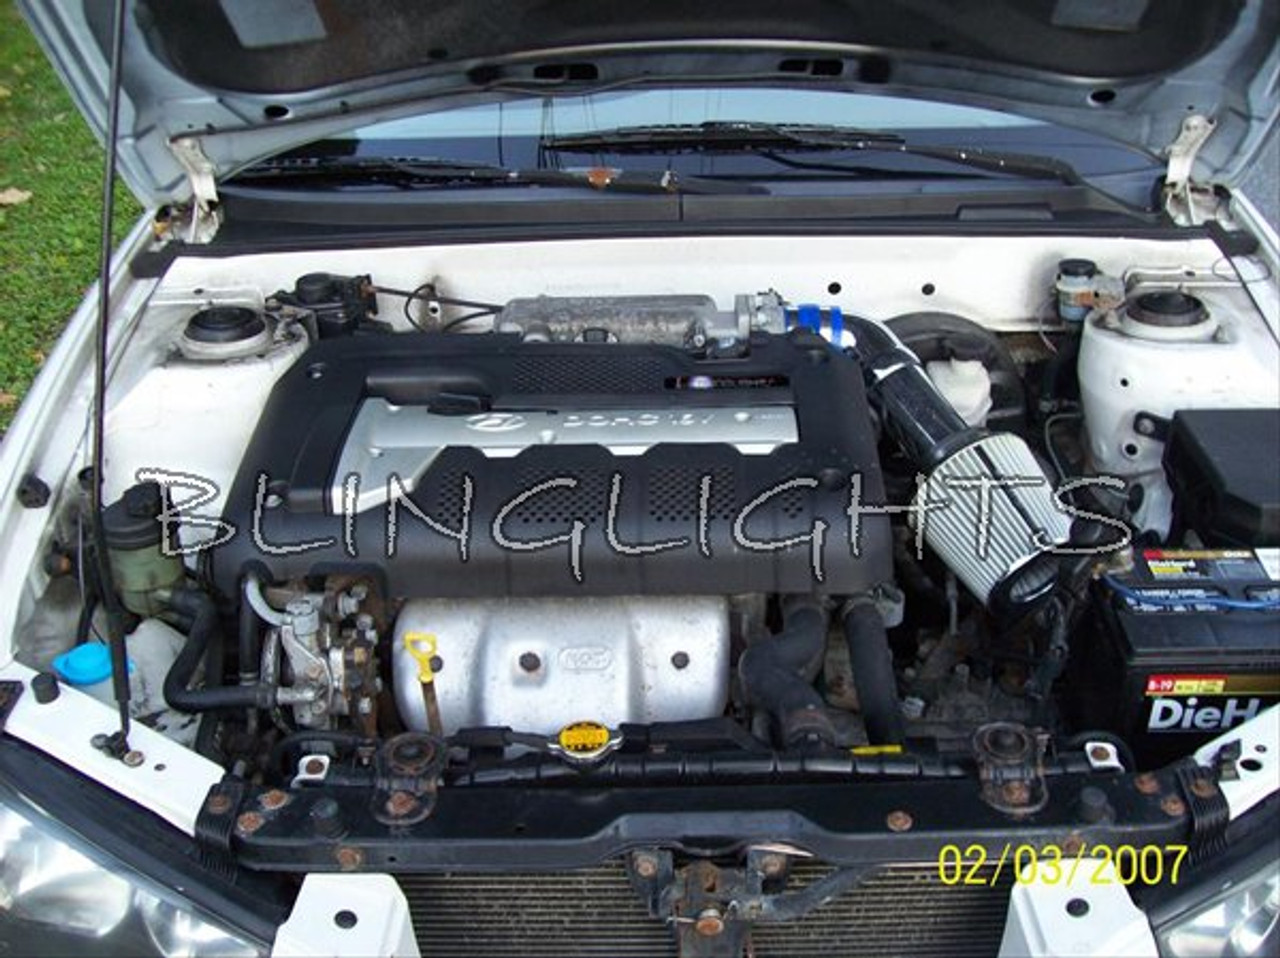 2001 2002 2003 2004 2005 2006 Hyundai Elantra Performance Engine Air Intake GLS GT 1.6L 1.8L 2.0L